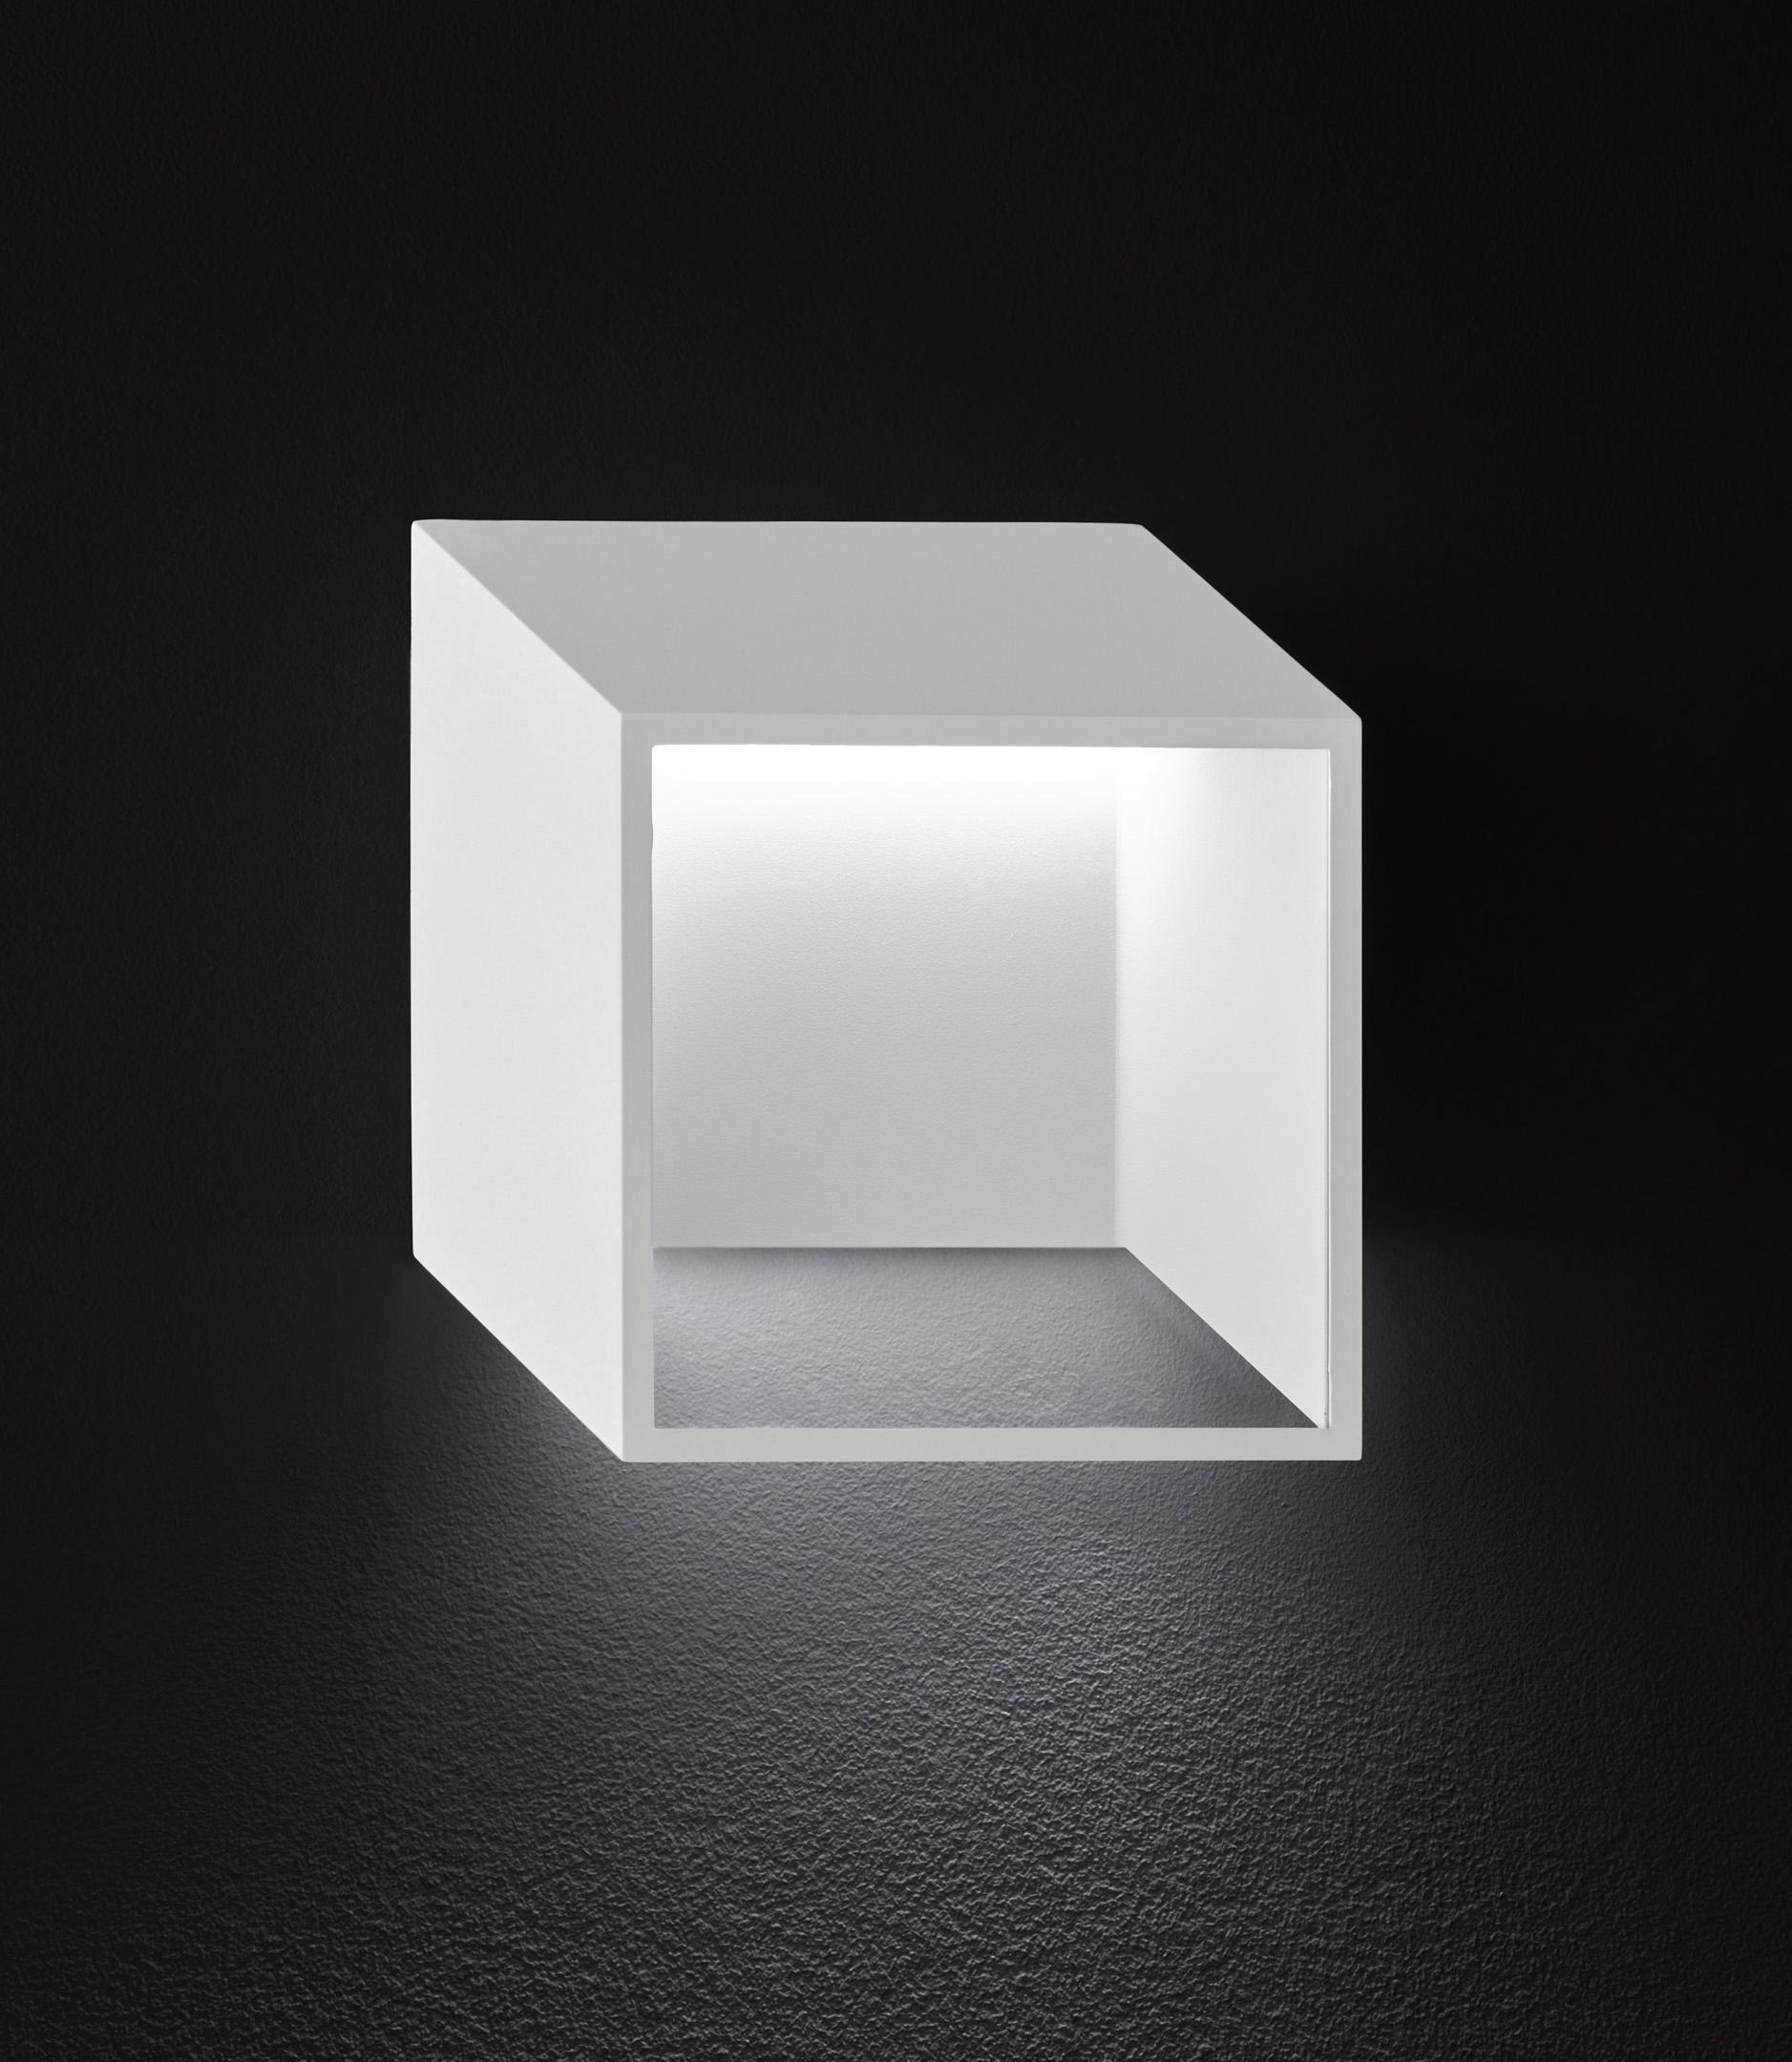 WOFI LED Wandleuchte QUEBEC, LED-Board, Warmweiß